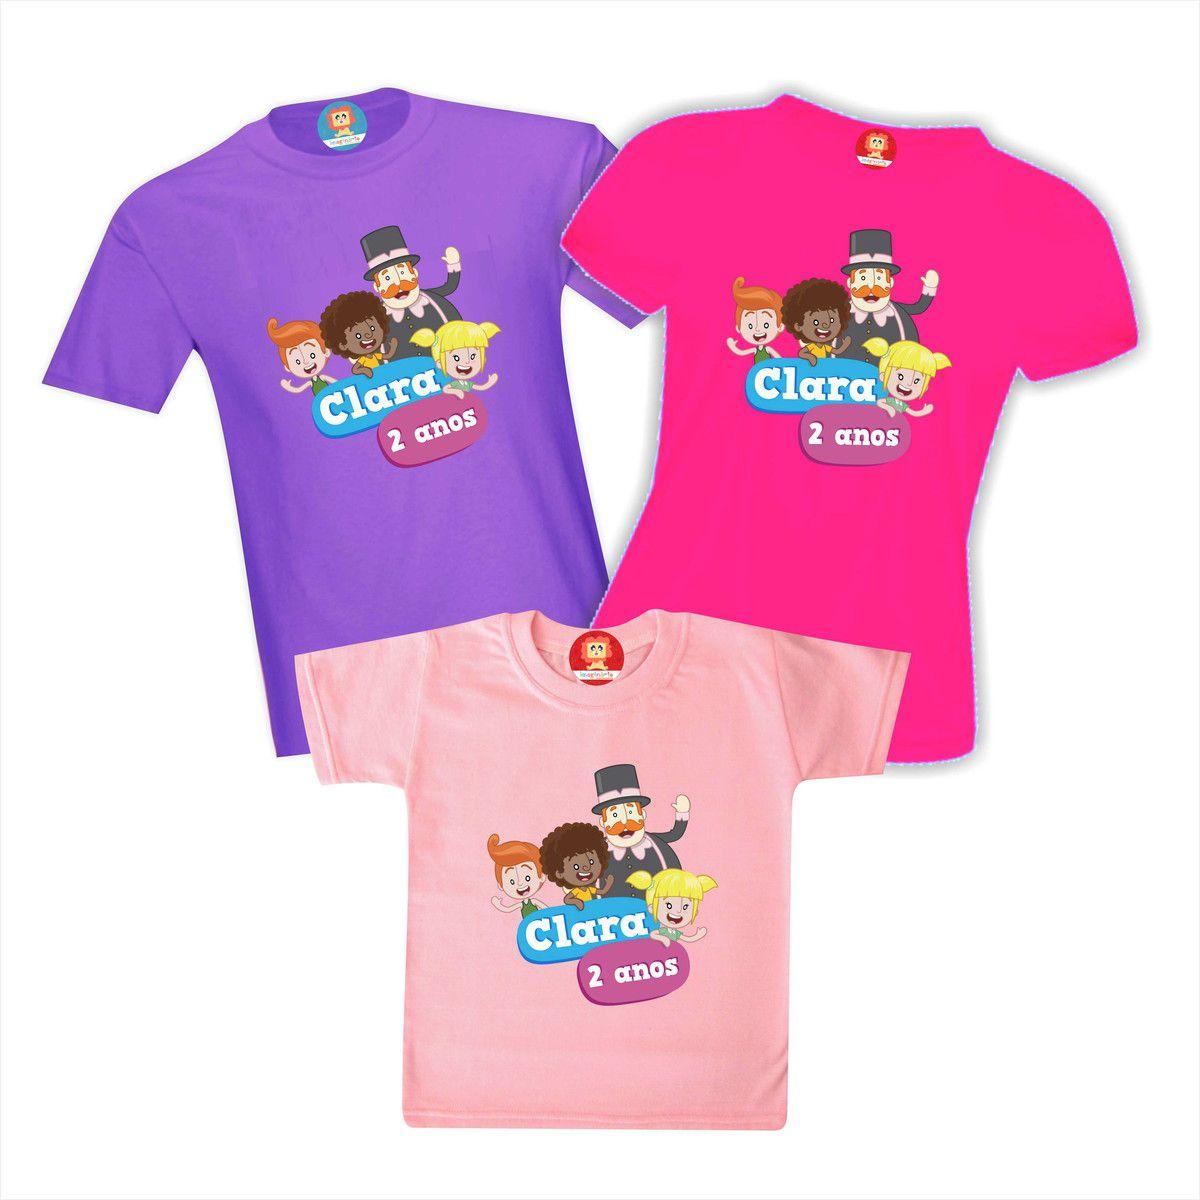 Kit Camisetas Festa Bita para Menina Personalizadas Com Nome